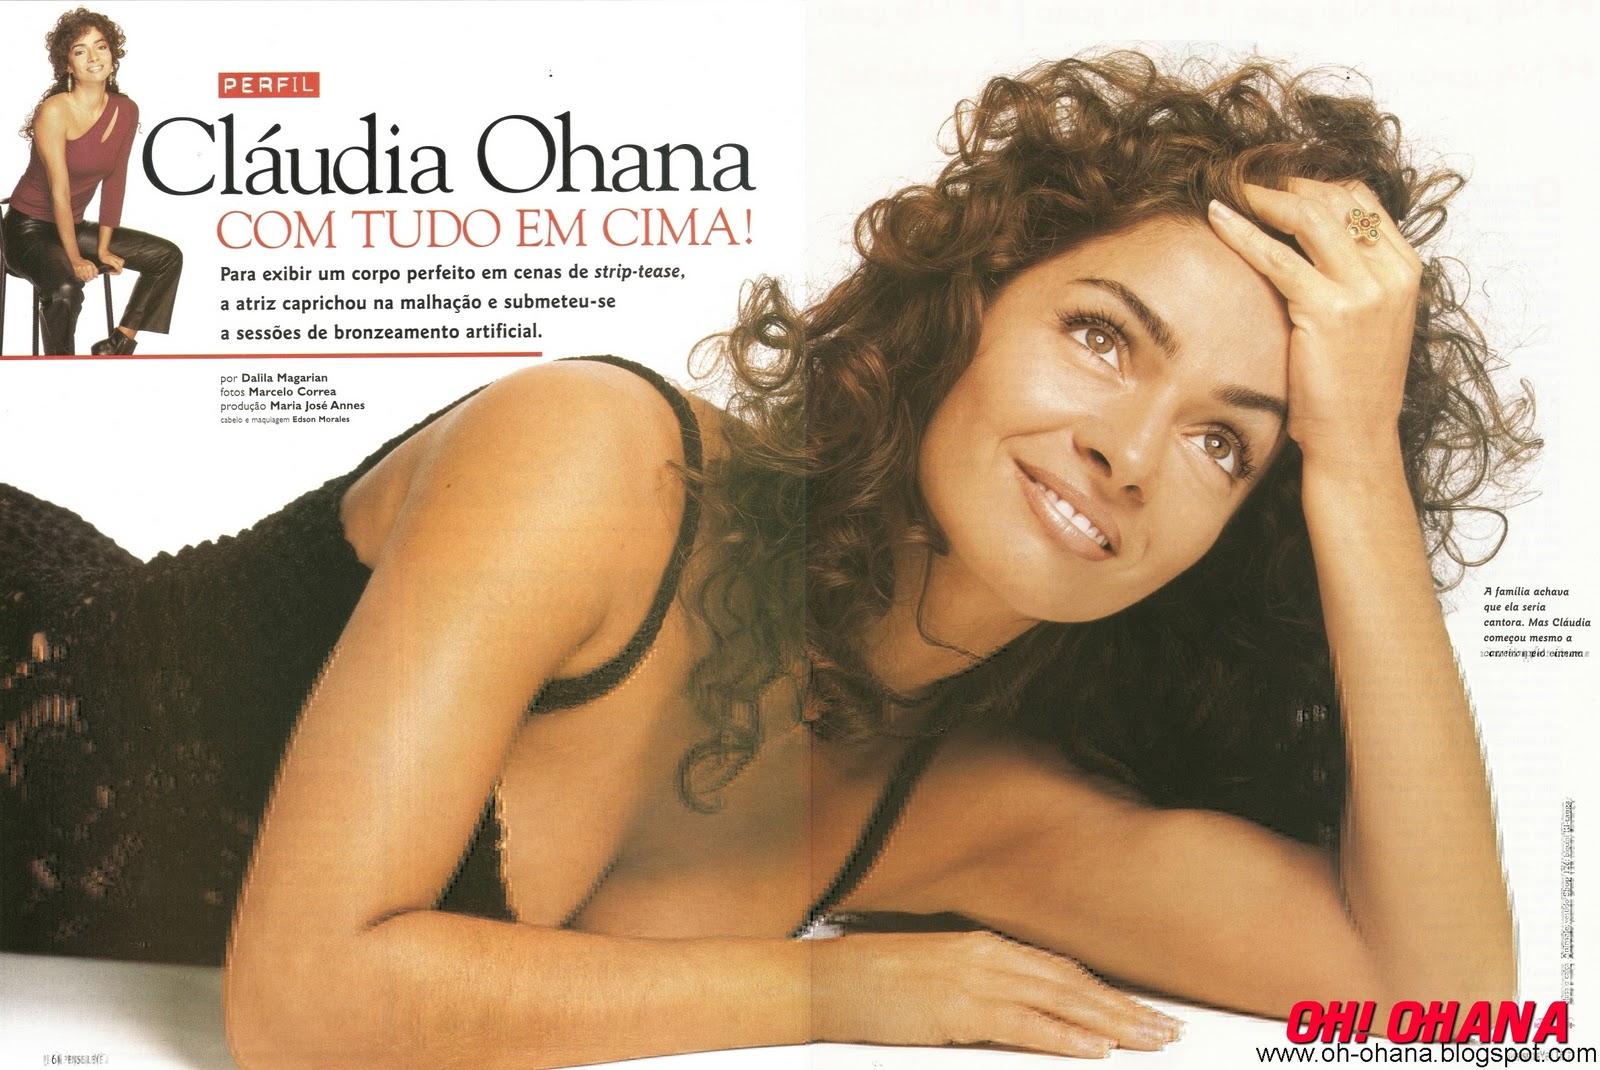 http://1.bp.blogspot.com/-B4hTvTCy8ks/Tq3Uy9Erw9I/AAAAAAAAAjk/fpV3uLhJe1M/s1600/Revista+Pense+Leve+-+Claudia+Ohana+-+com+tudo+em+cima-parte+1.jpg